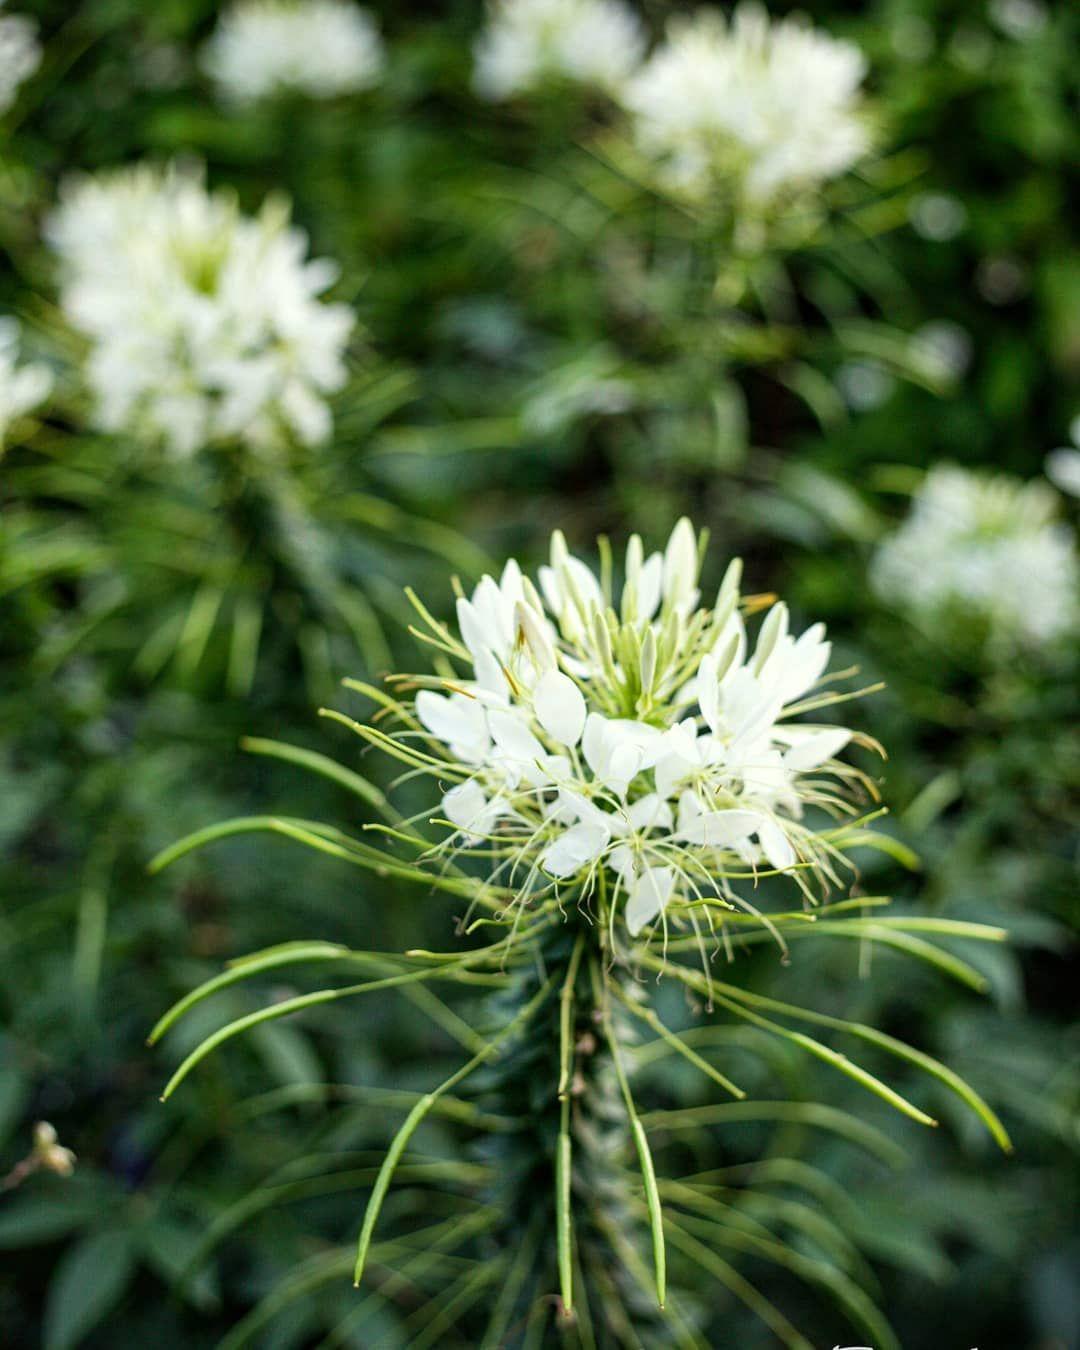 White flower. Kassel, Karlsaue.  Photographer: @salogwyn_fine_Art  #nature #naturelovers #casselfornia #kassel #kasselfornia #wonderful_places #wonderfullife #beautifulnature #beautifullight #motherearth #worldbestshot #seascape #photography #divine_worldplaces #challenge #photooftheday #photoshoot #colorful #gurushotschallenge #gurushots #shotaward #ig_mood #autumn #autumnvibes🍁 #amazing_shots #flowers #flowerstagram #flowerpower #whiteflower